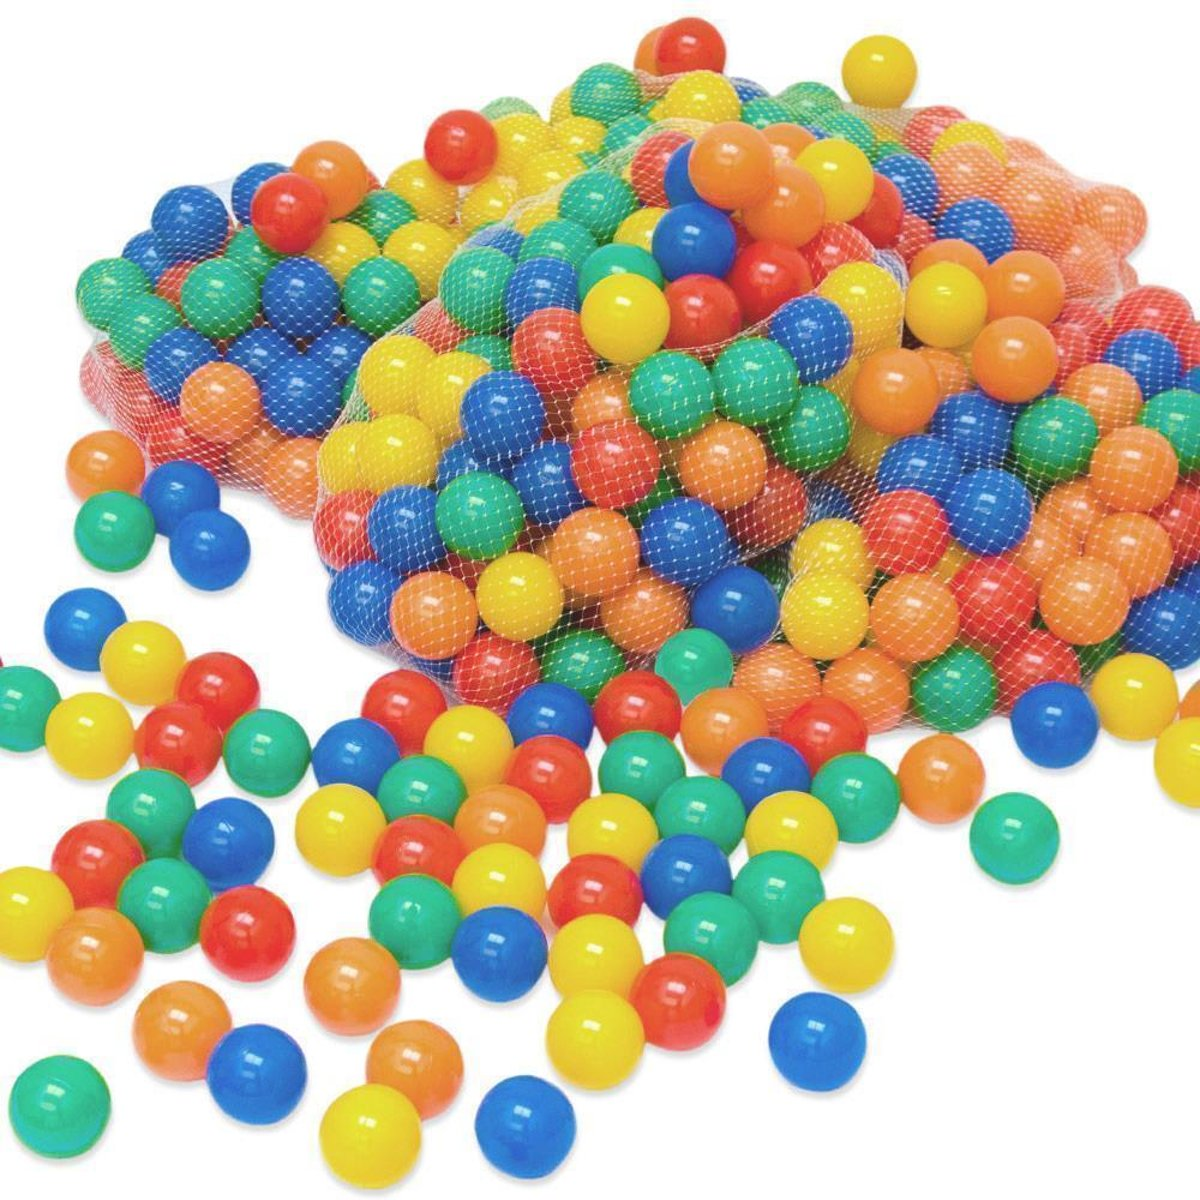 Kogelballen 6 cm diameter 900 ballen